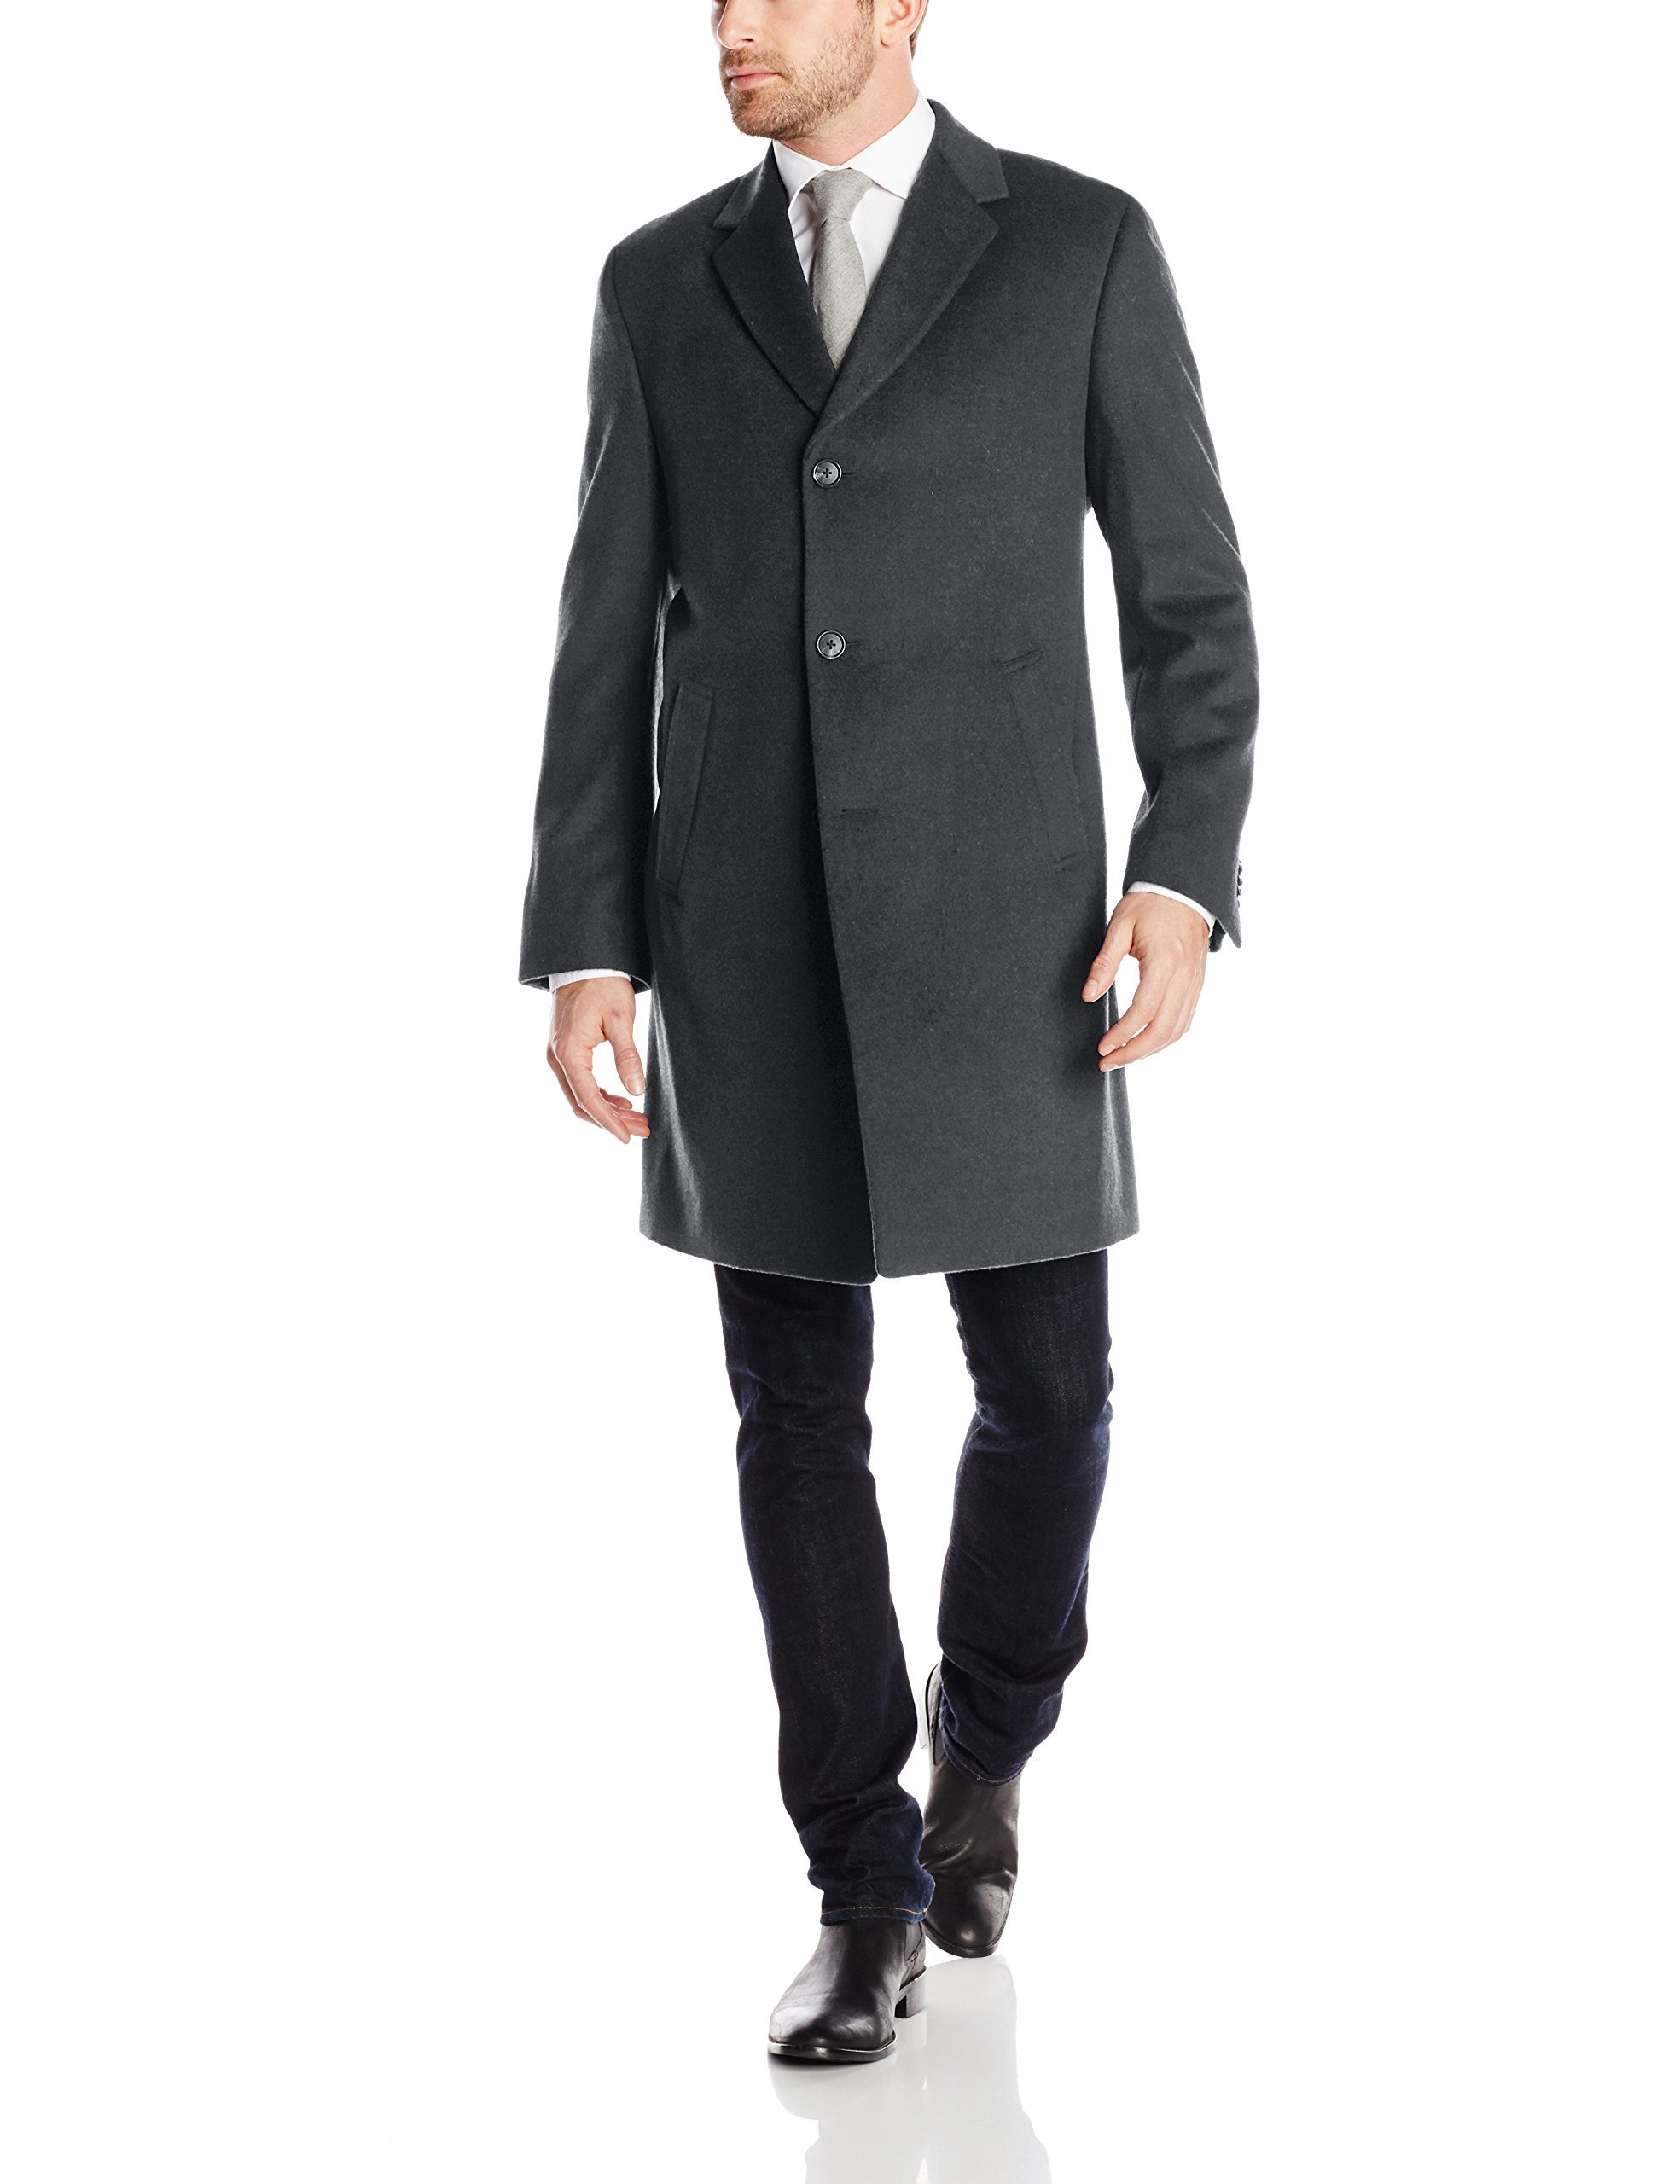 Kenneth Cole REACTION Men's Raburn Wool Top Coat, Charcoal, 38 Short